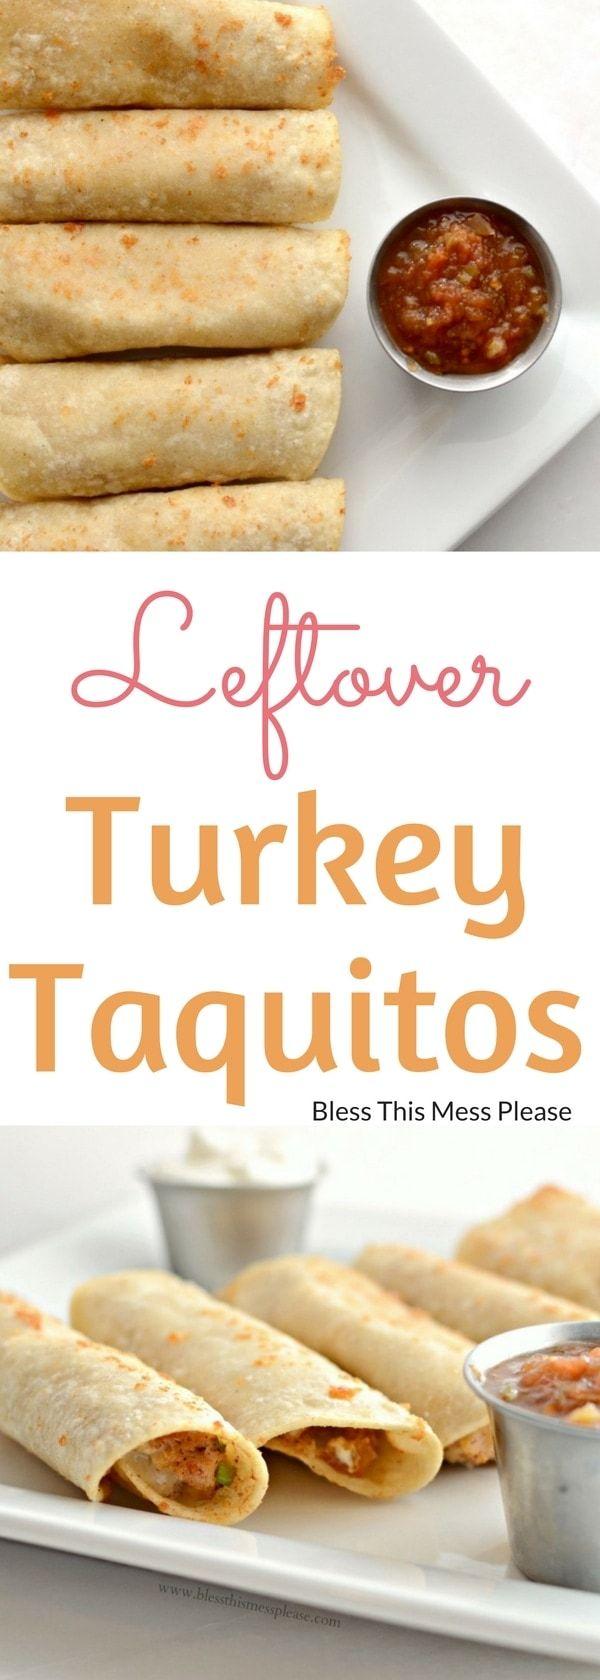 Leftover Turkey Taquitos — Tasty & Easy Shredded Meat Taquito Recipe